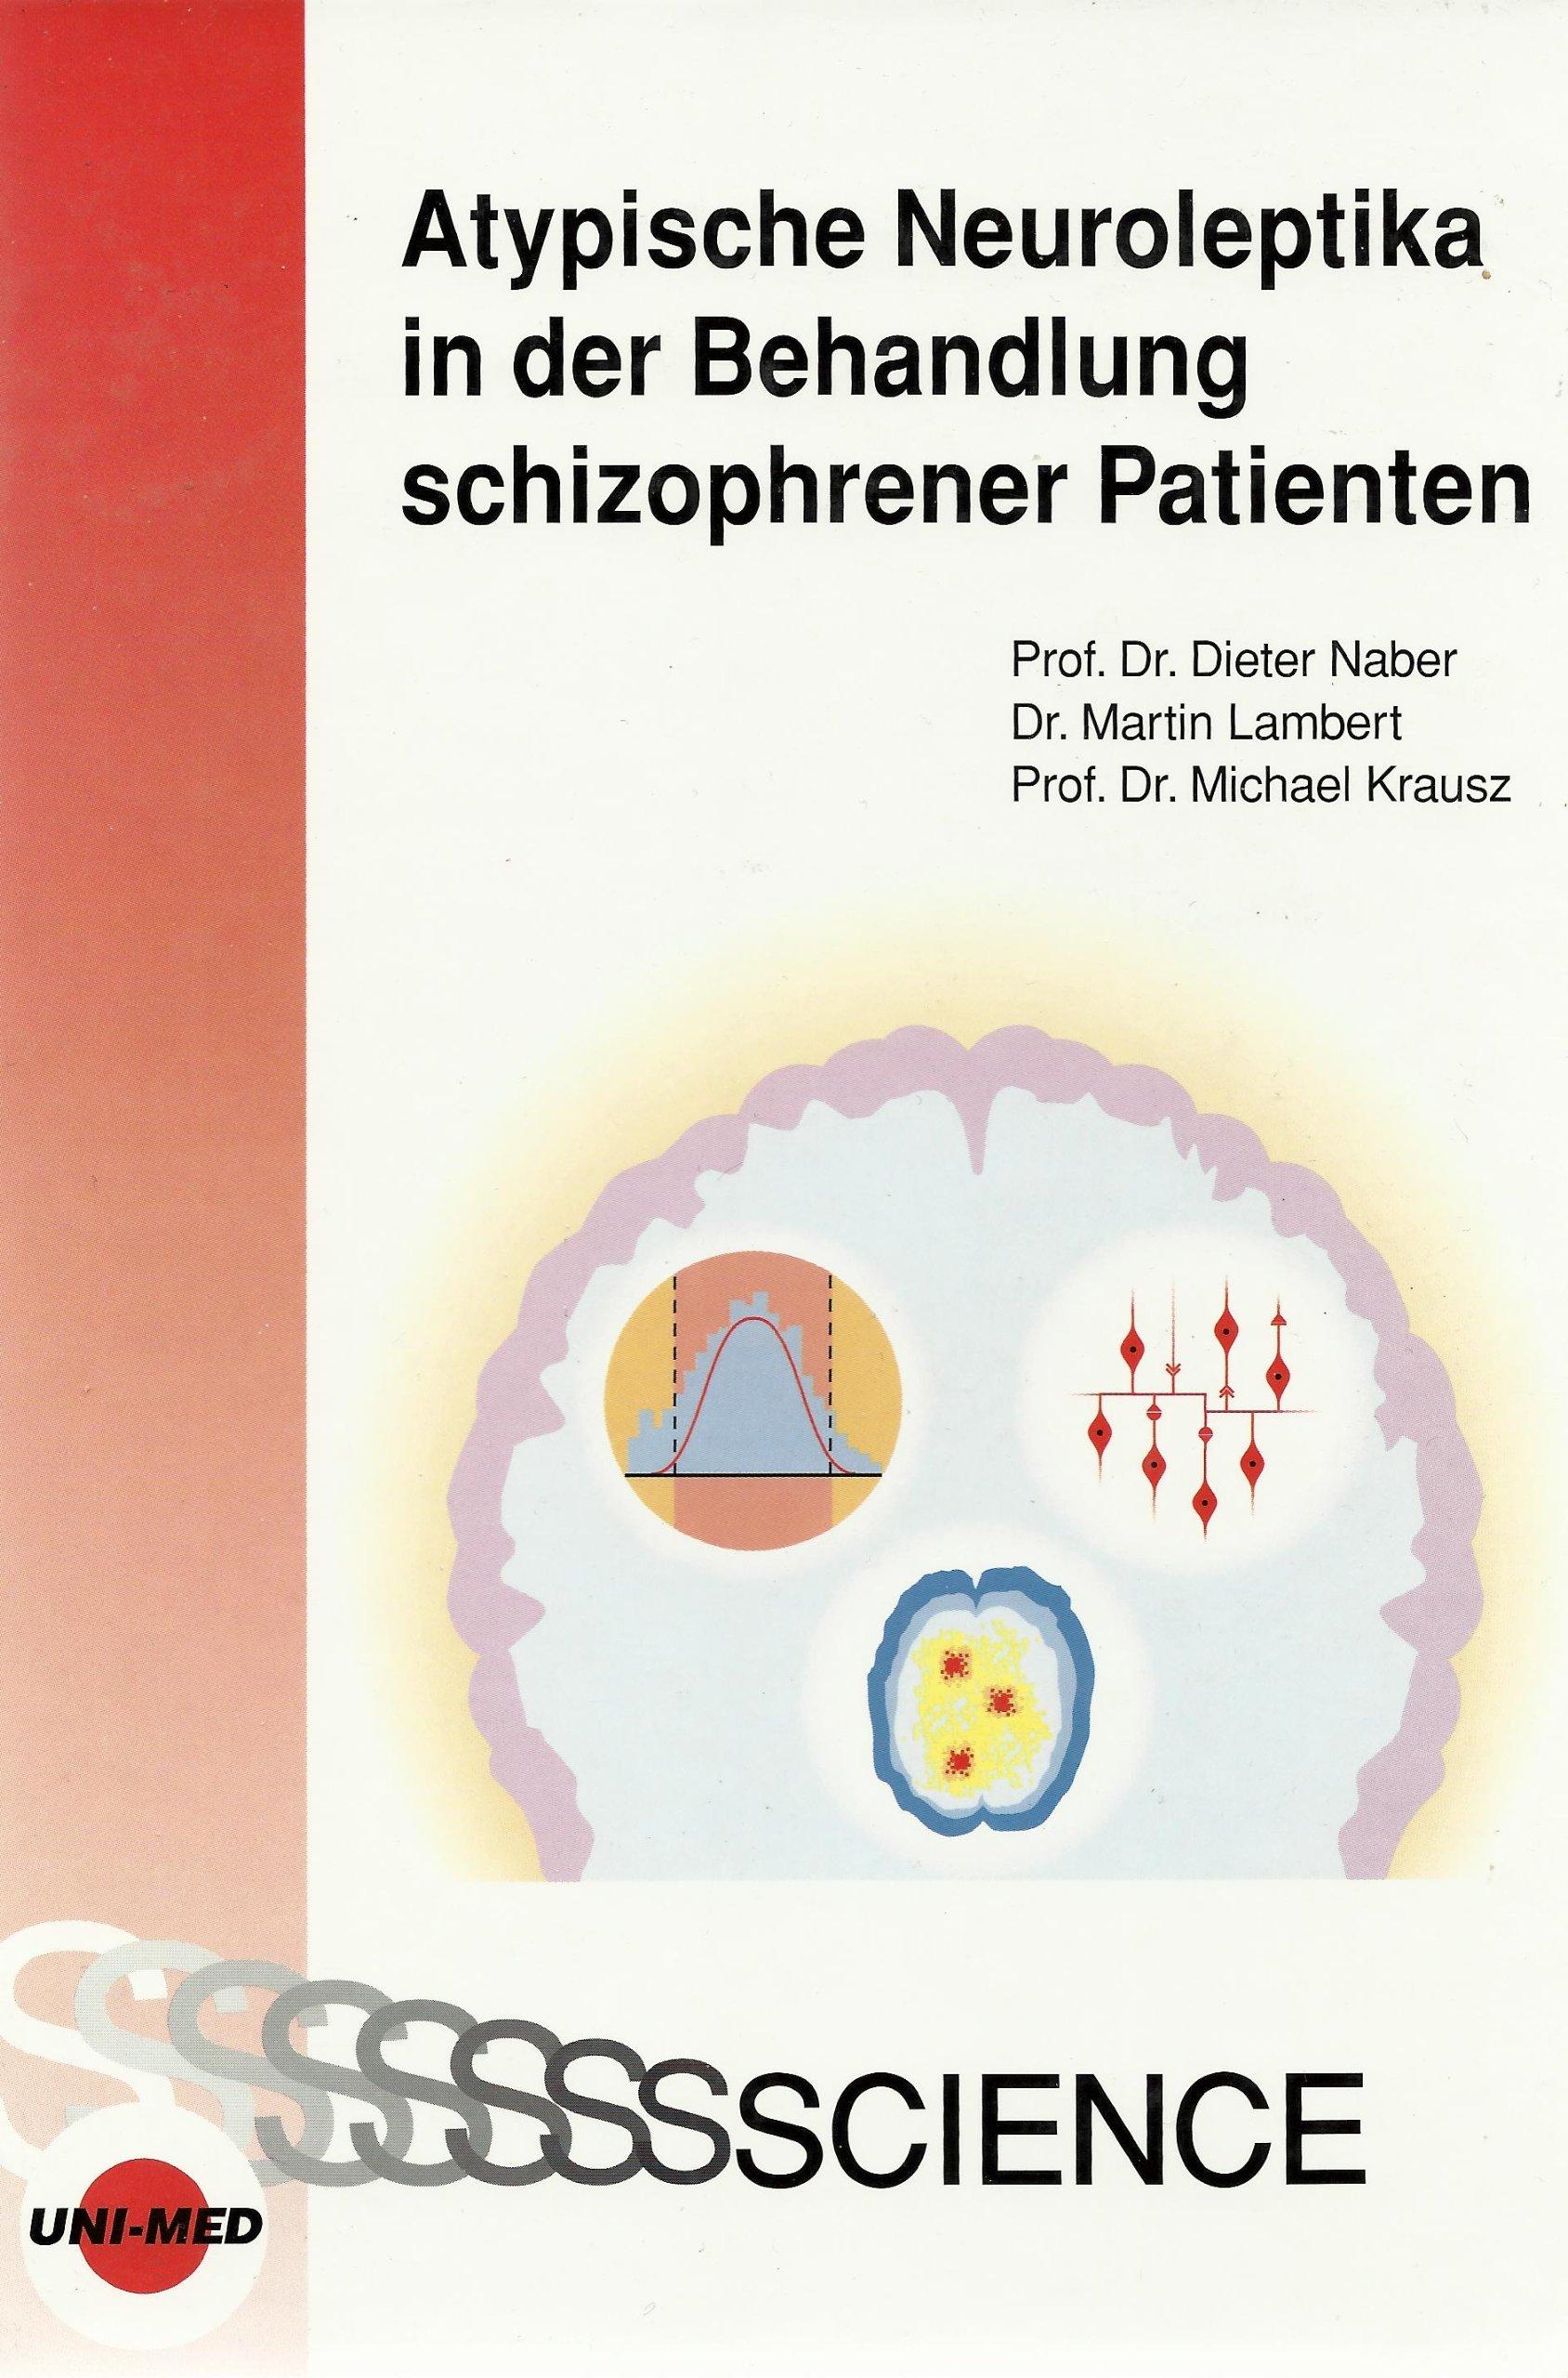 Atypische Neuroleptika in der Behandlung schizophrener Patienten